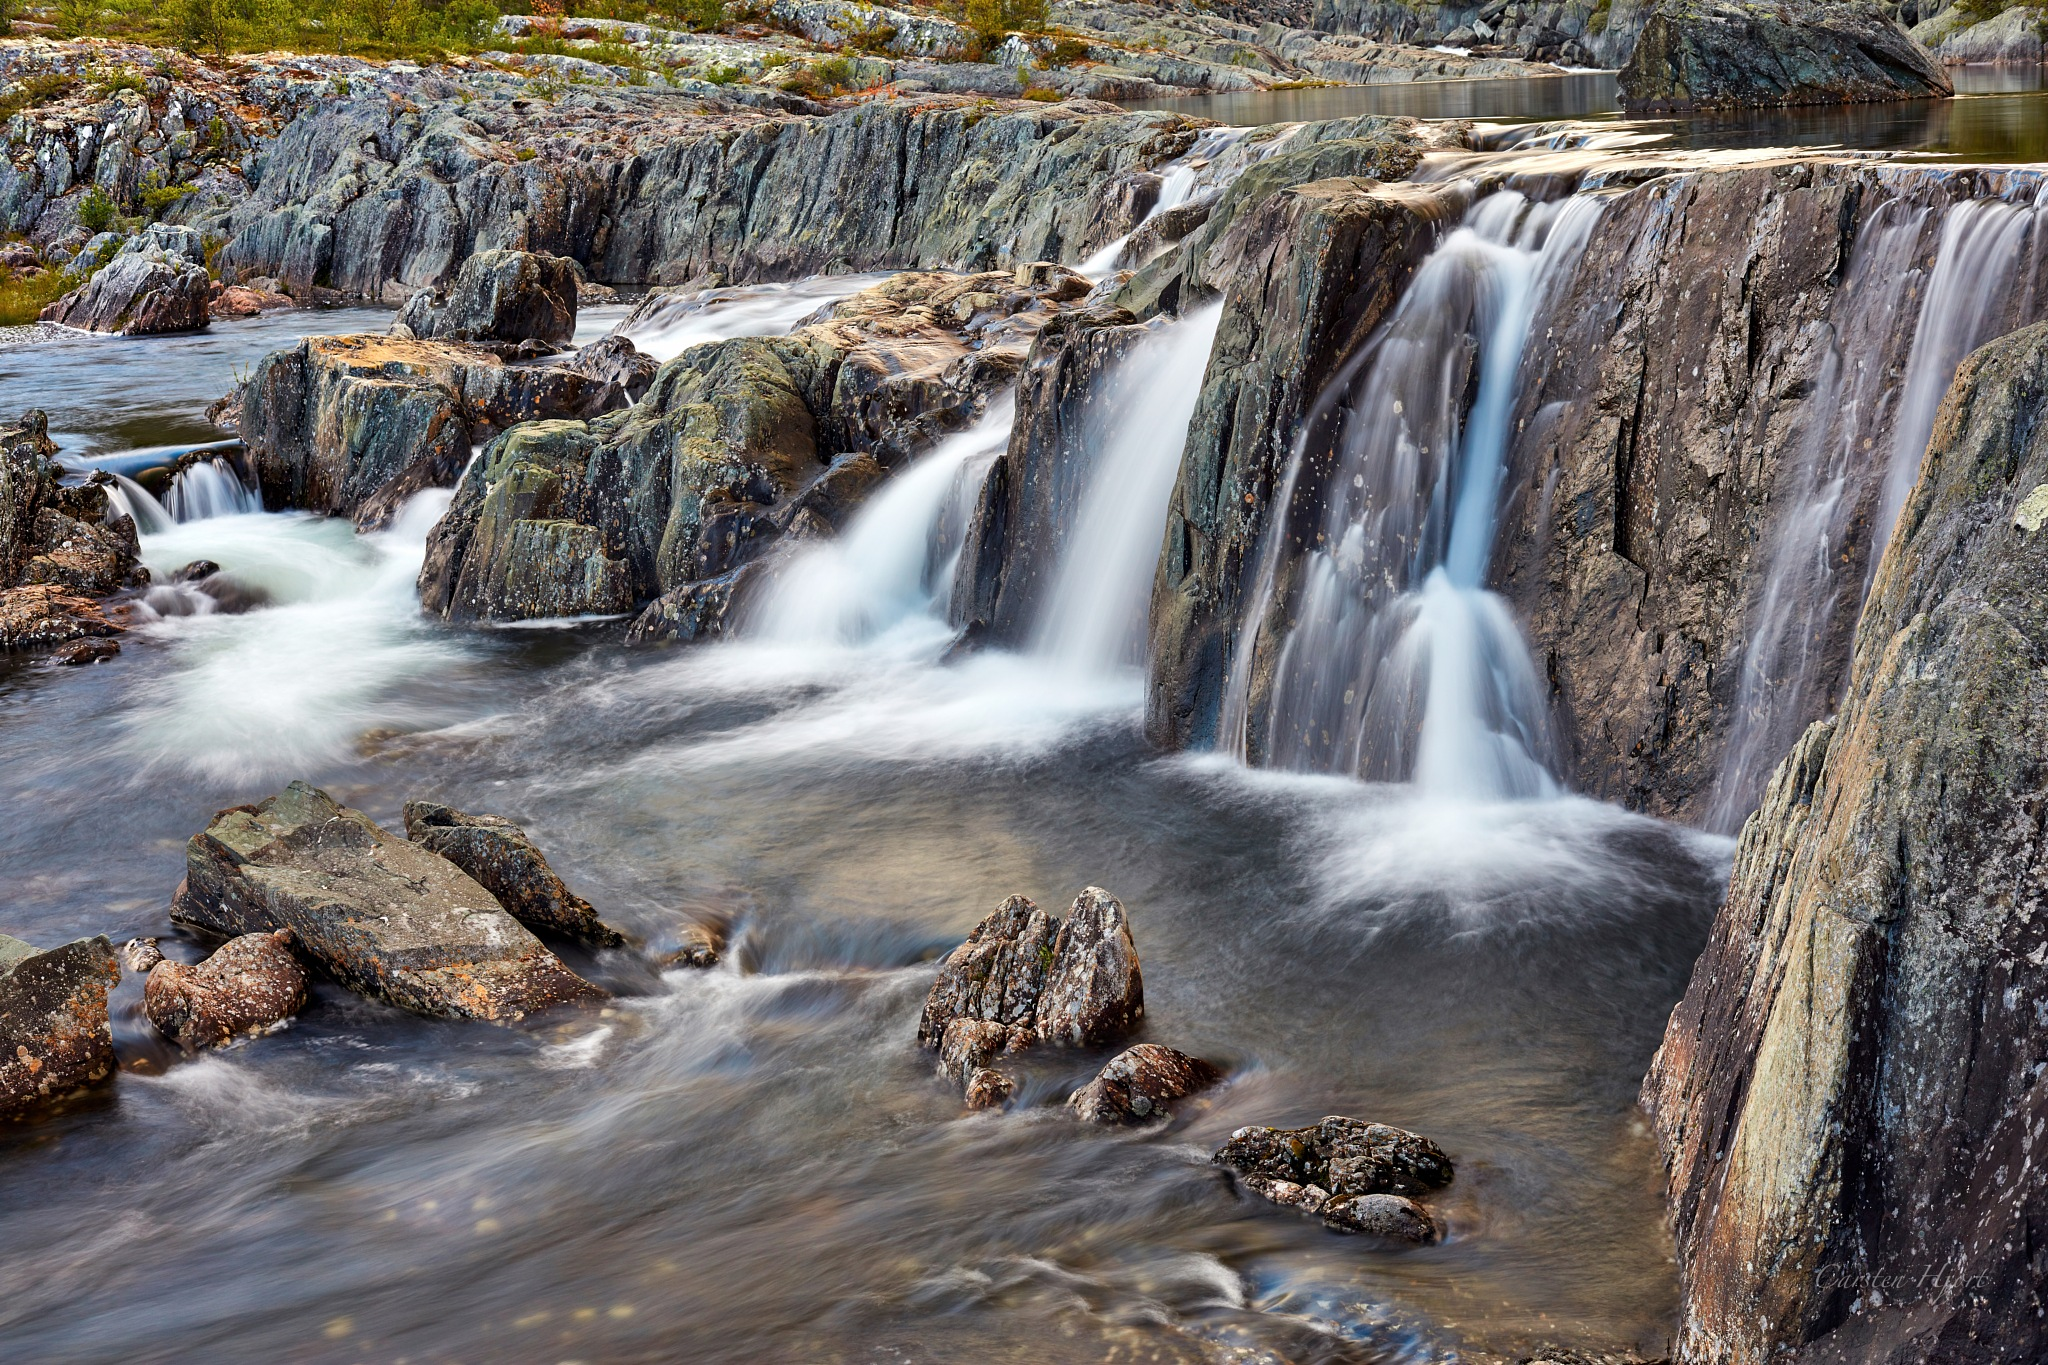 Long exposure Telemark by Carsten Hjort